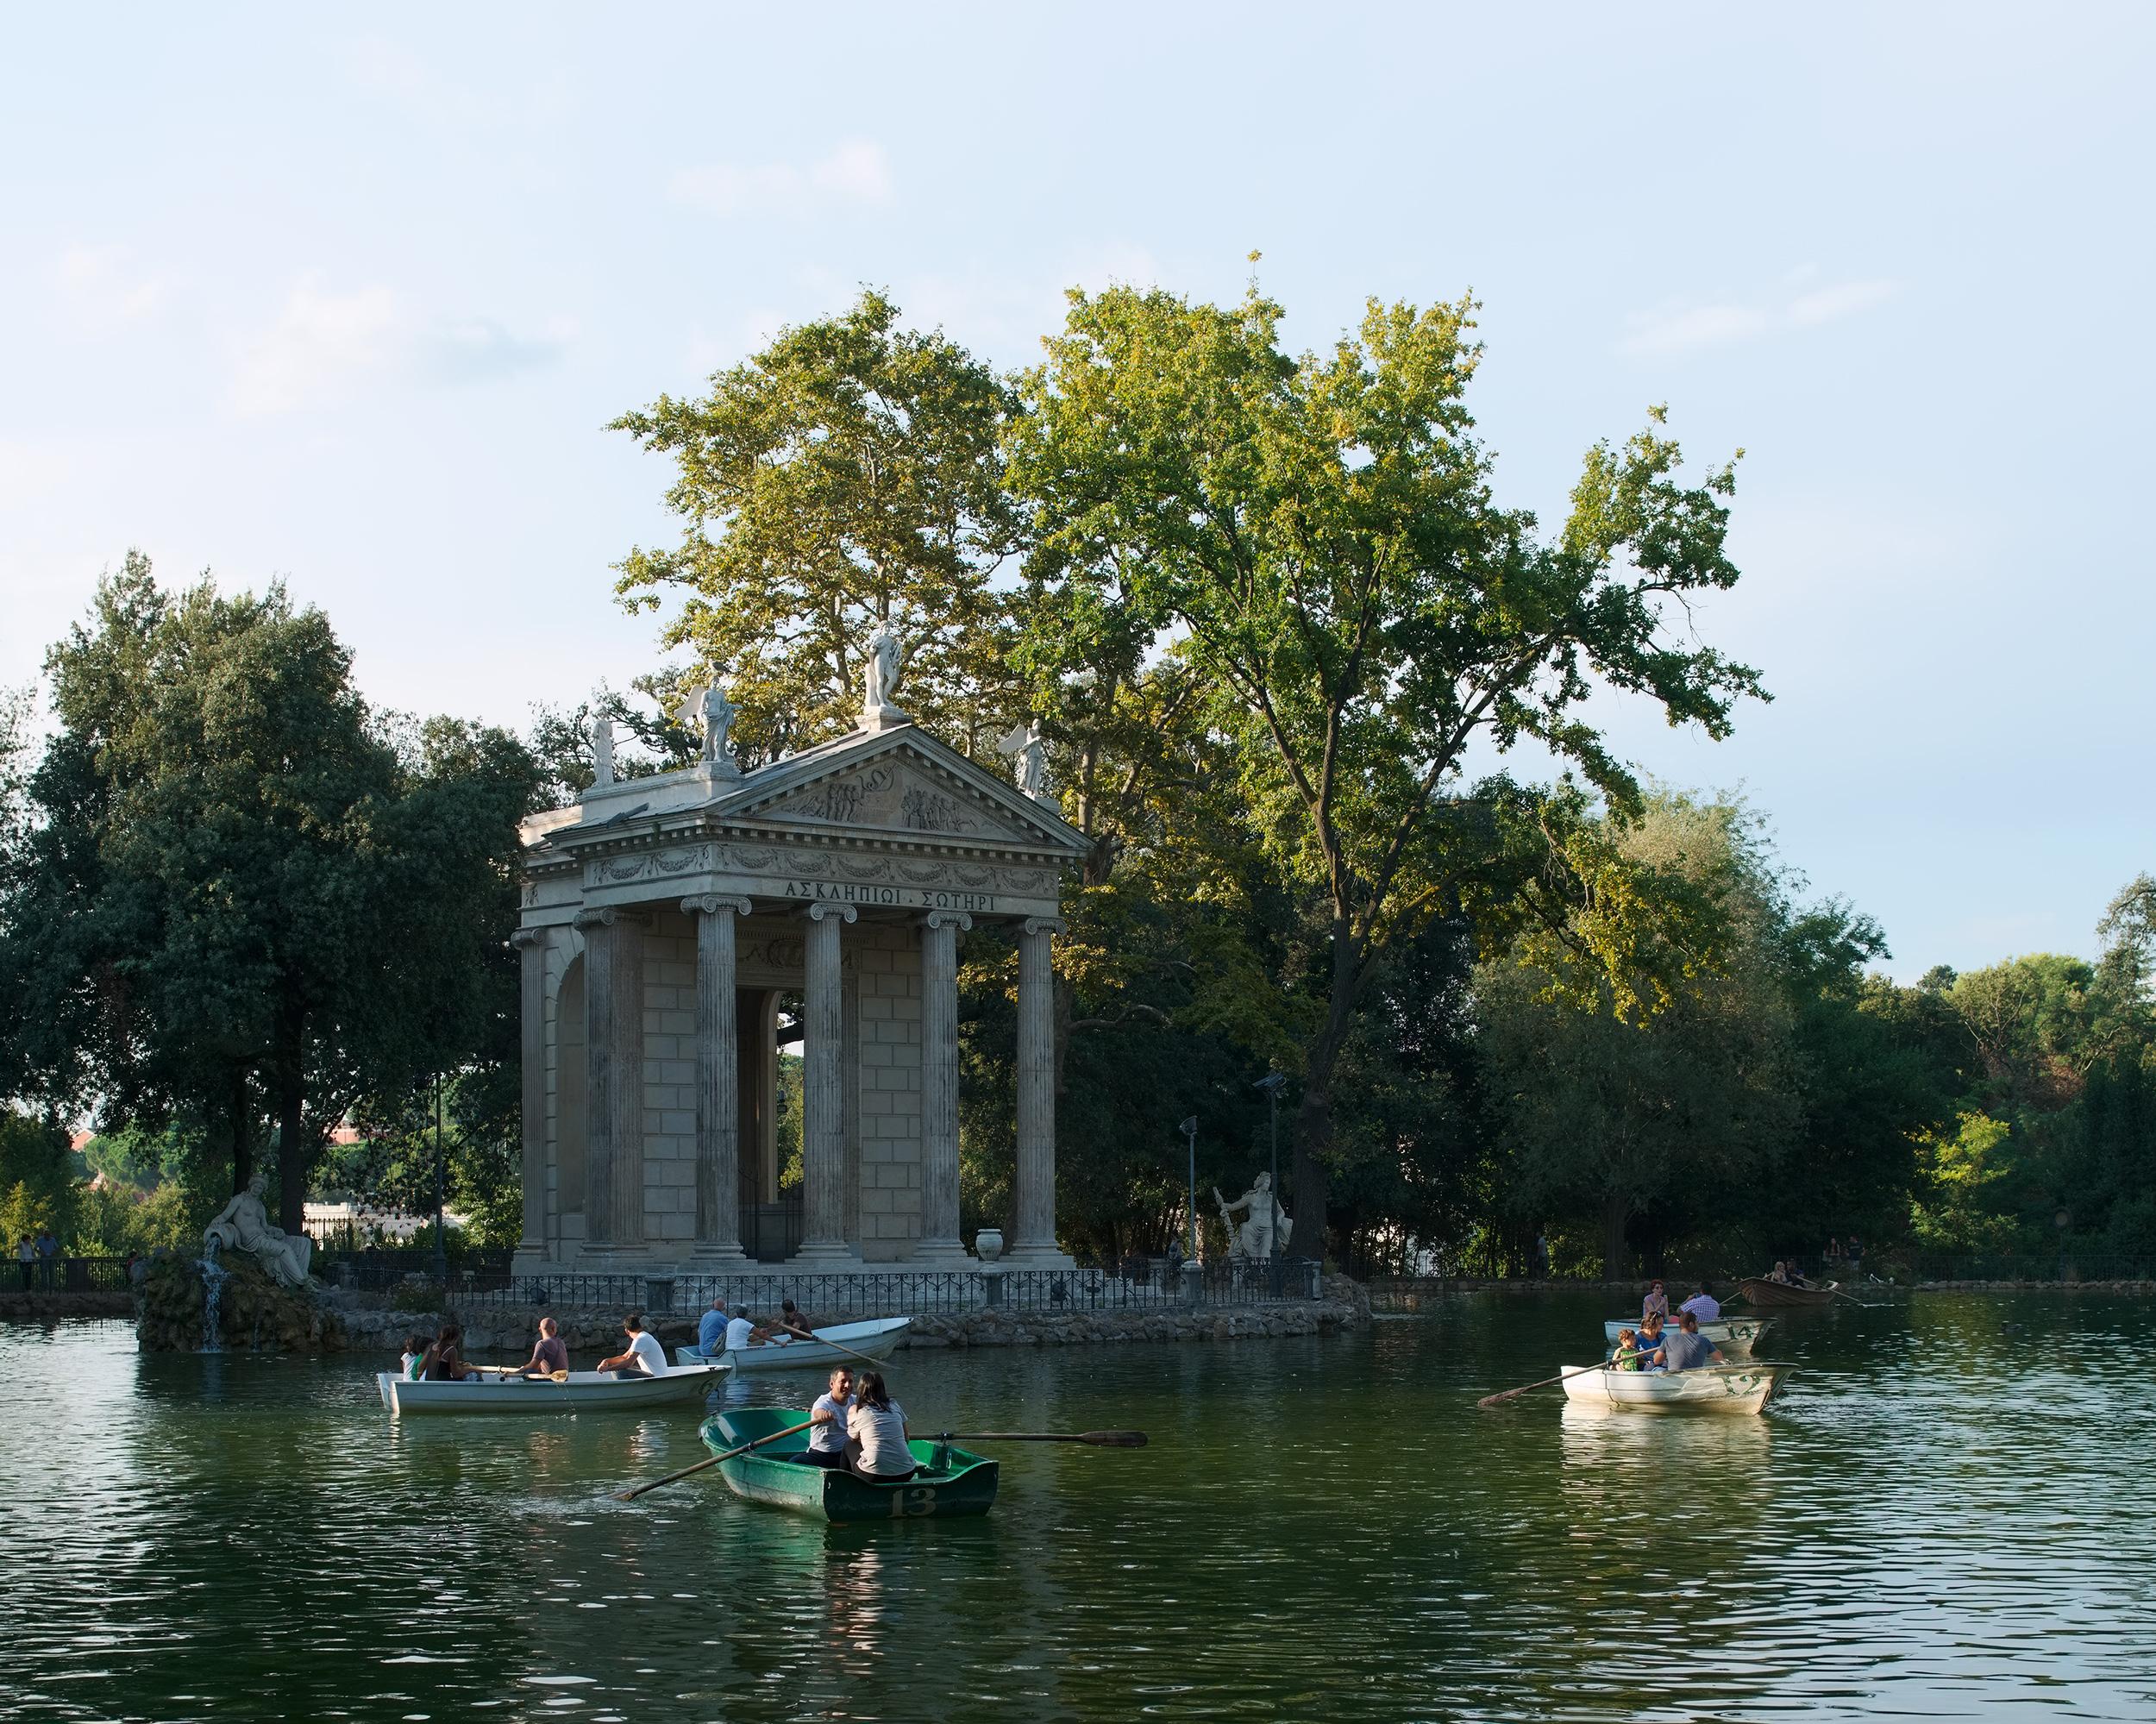 Villa_Borghese–30x37–FINAL.jpg